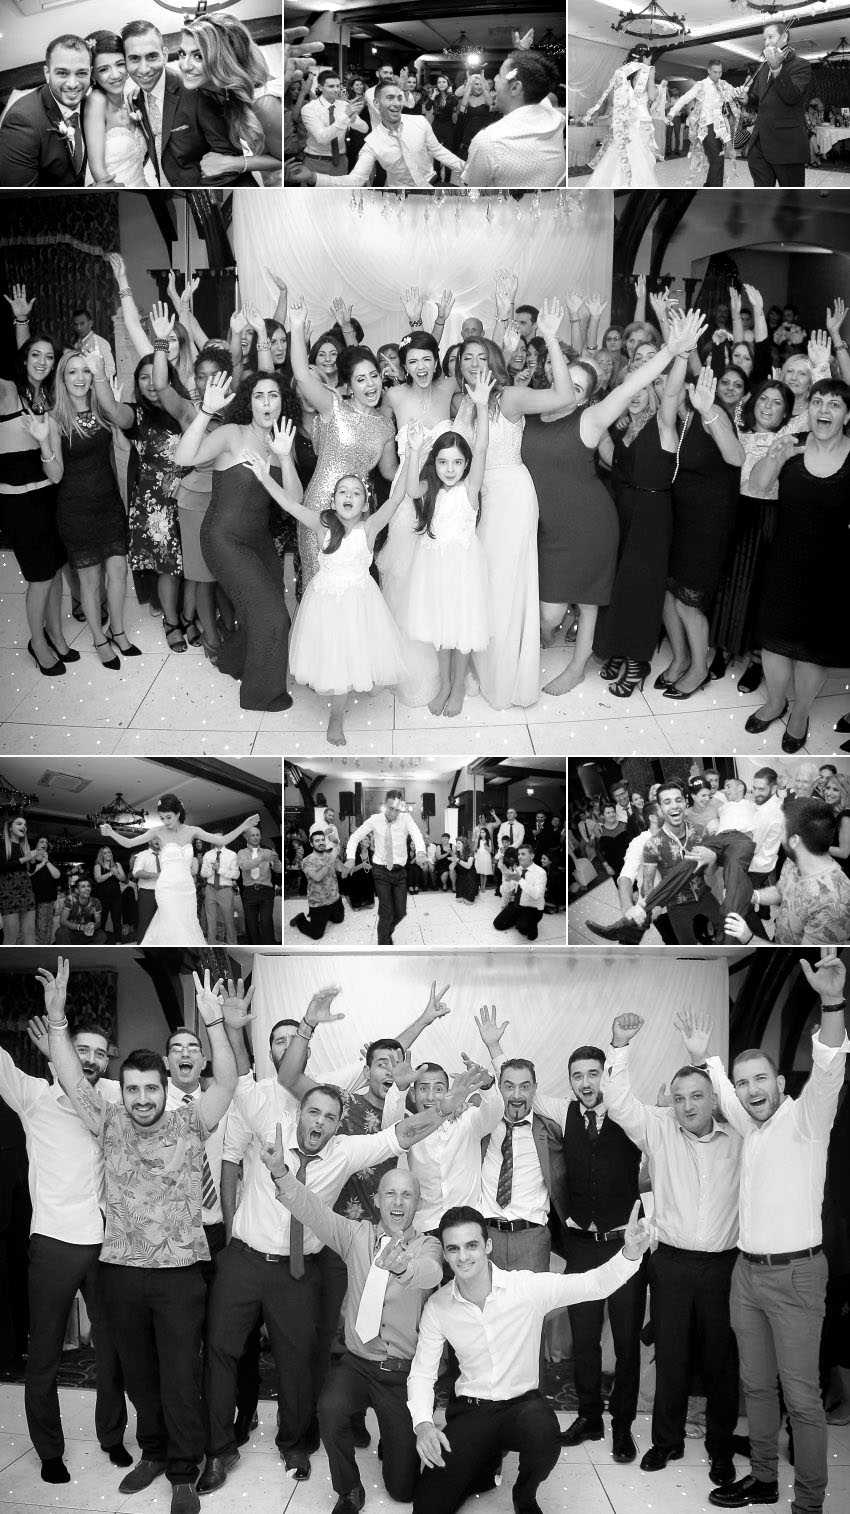 Wedding dances at Royal Chase venue 15